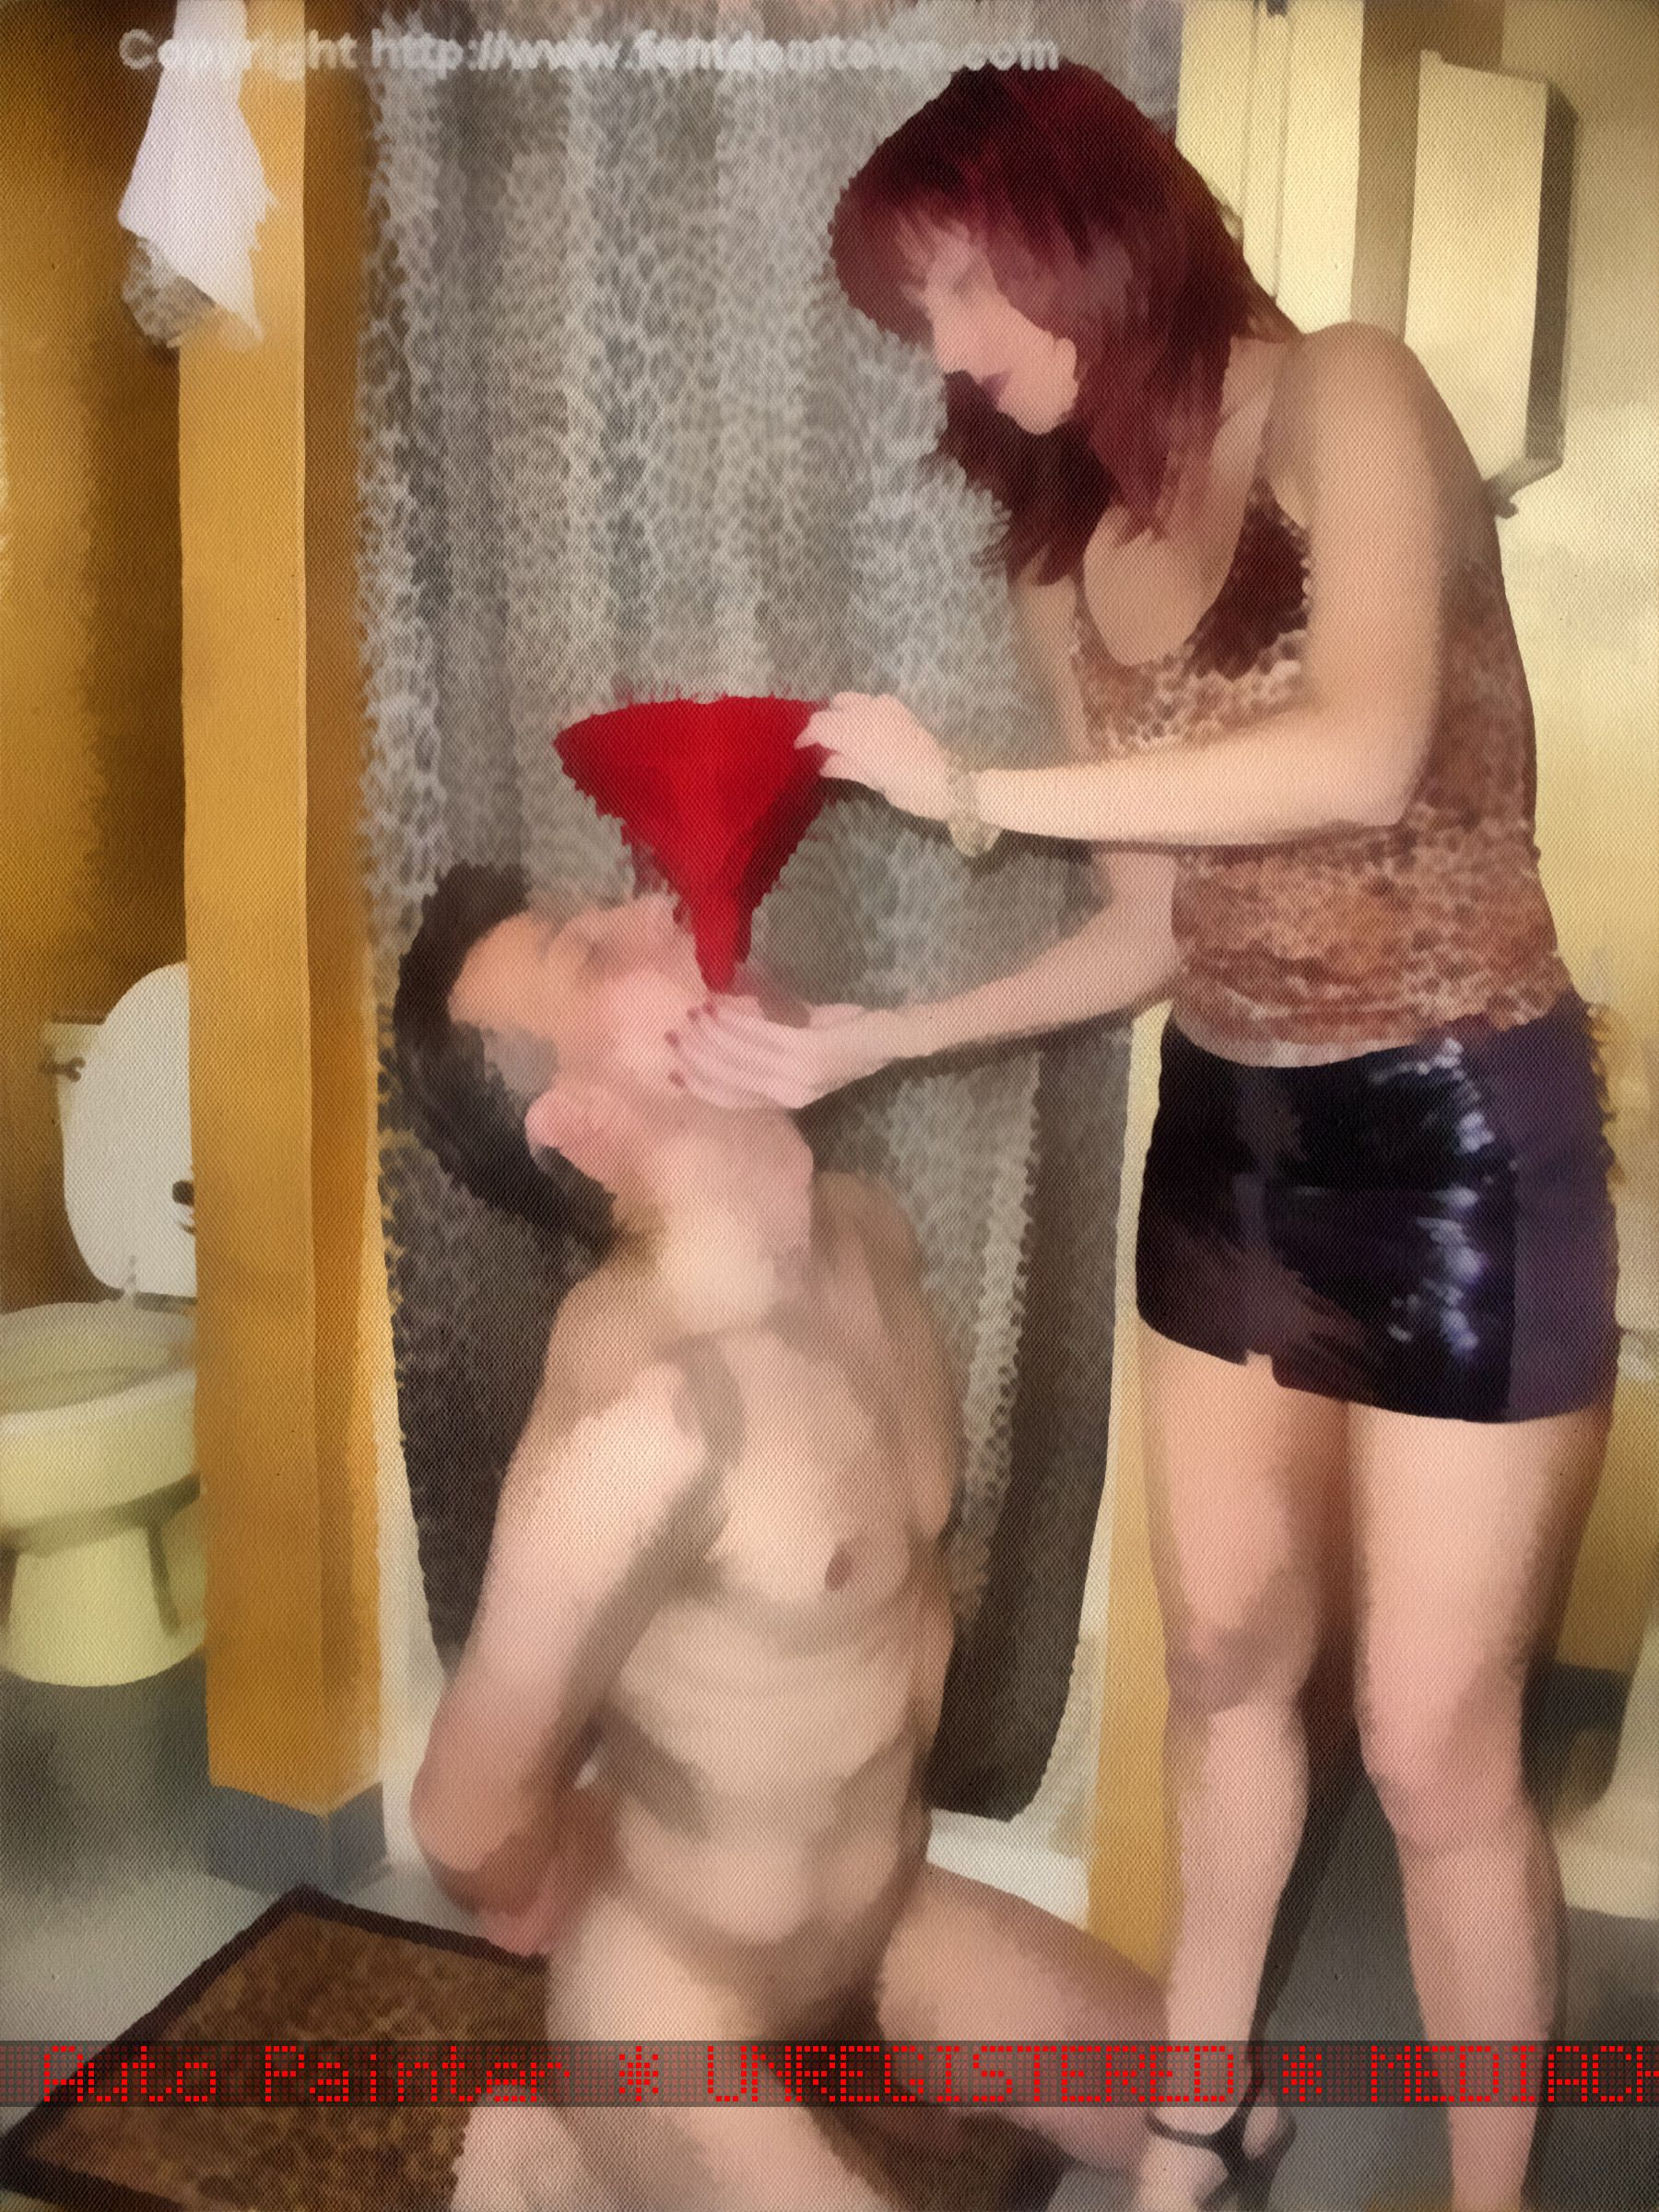 Femdom - toilet training